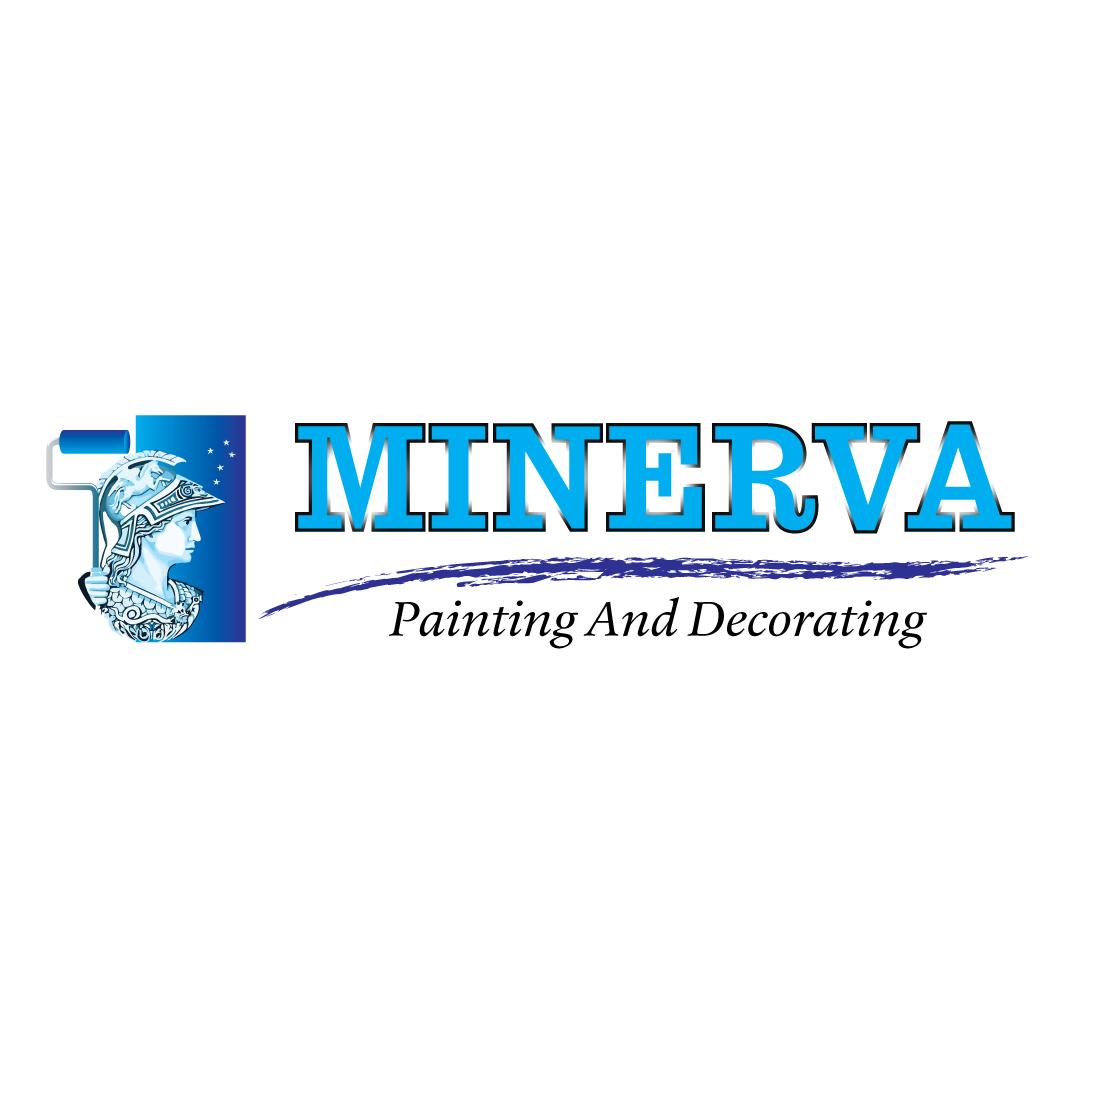 Logo Design by Dan Cristian - Entry No. 63 in the Logo Design Contest New Logo Design for Minerva Painting & Decorating Ltd..